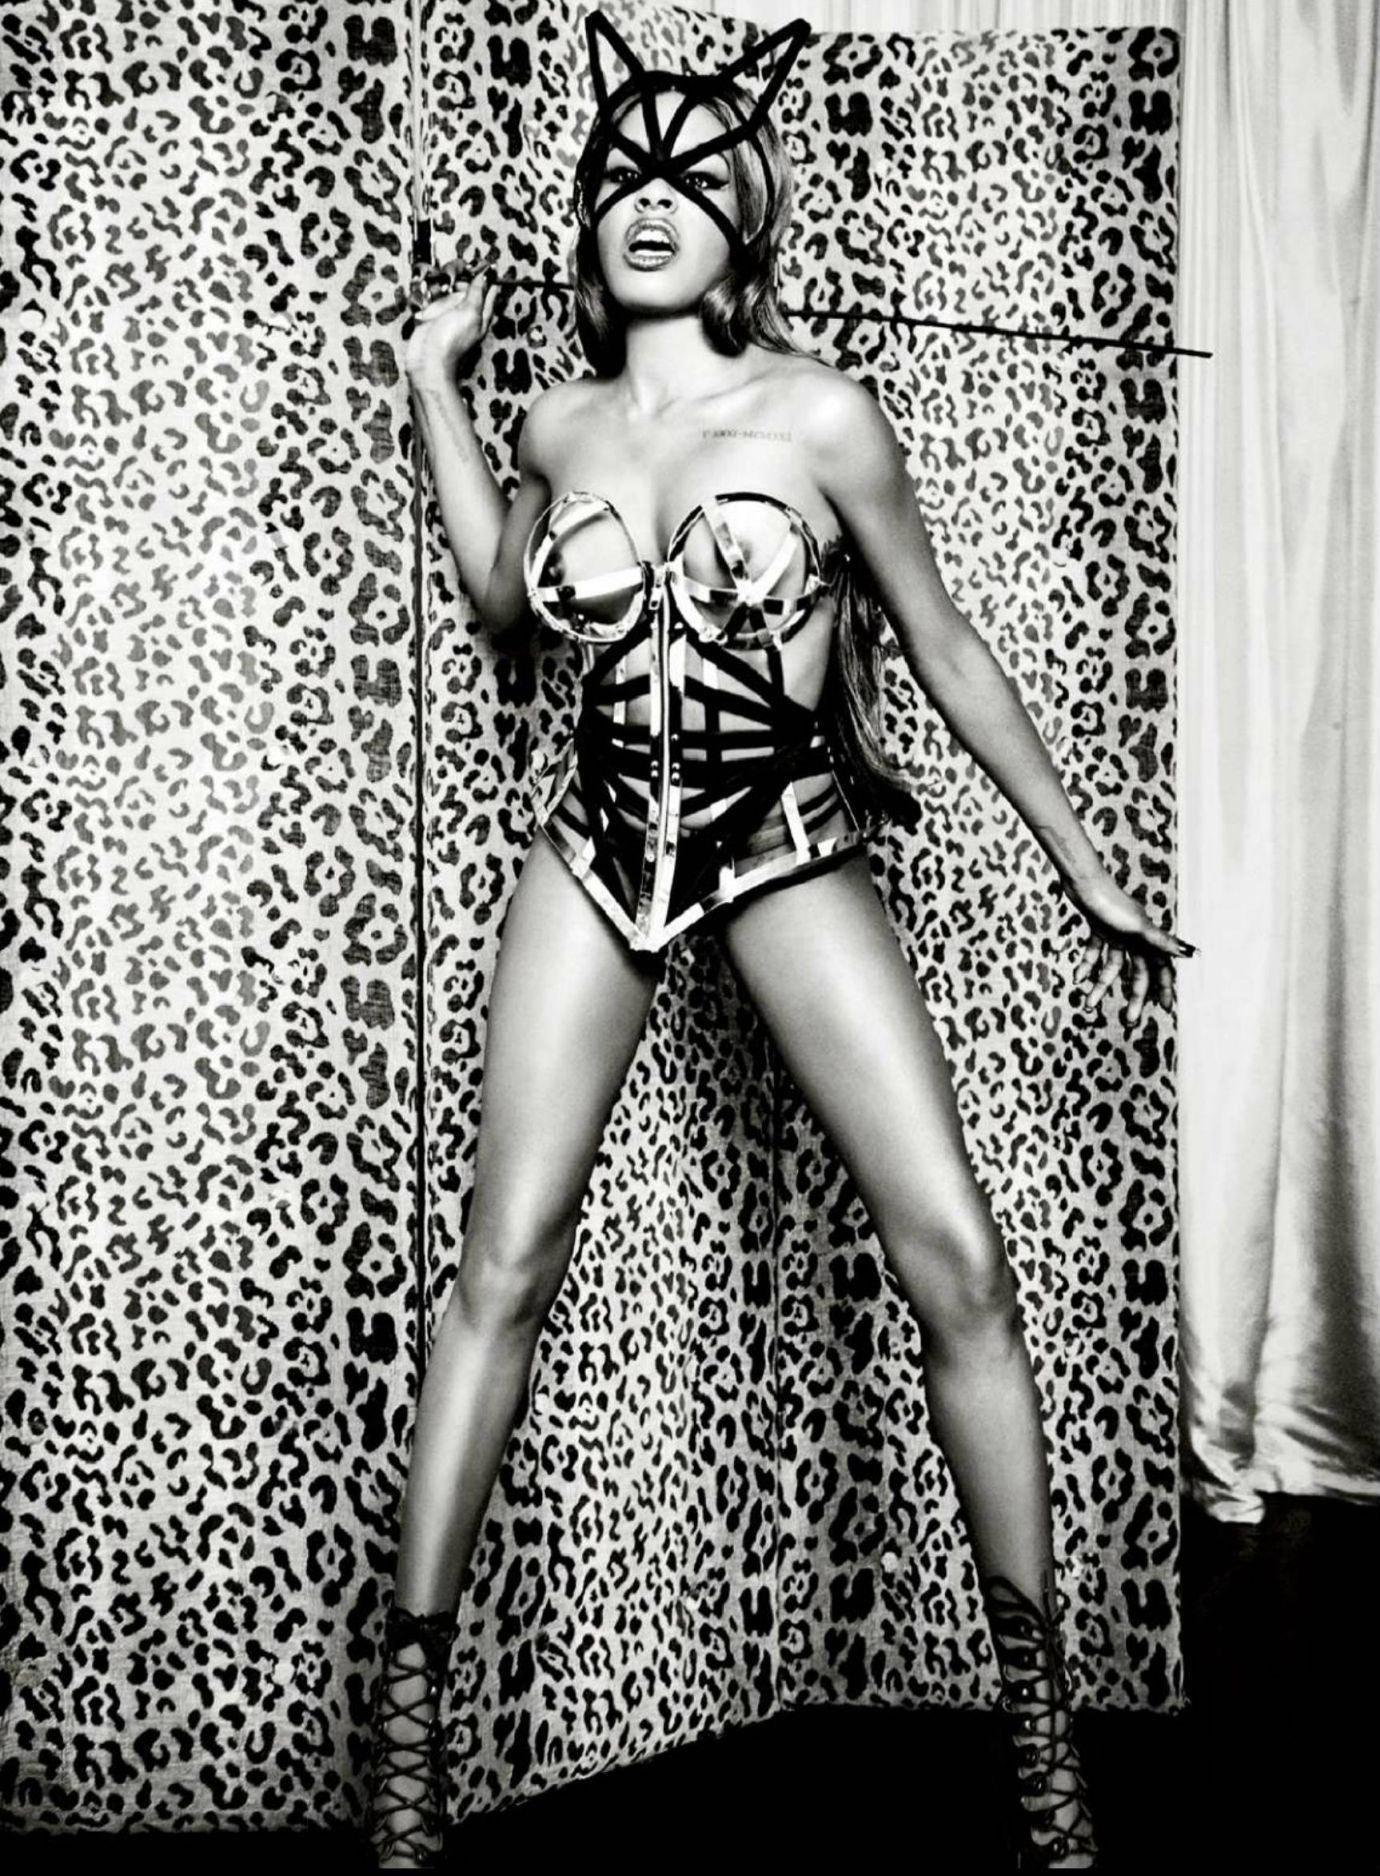 Azealia Banks Full Frontal Nude